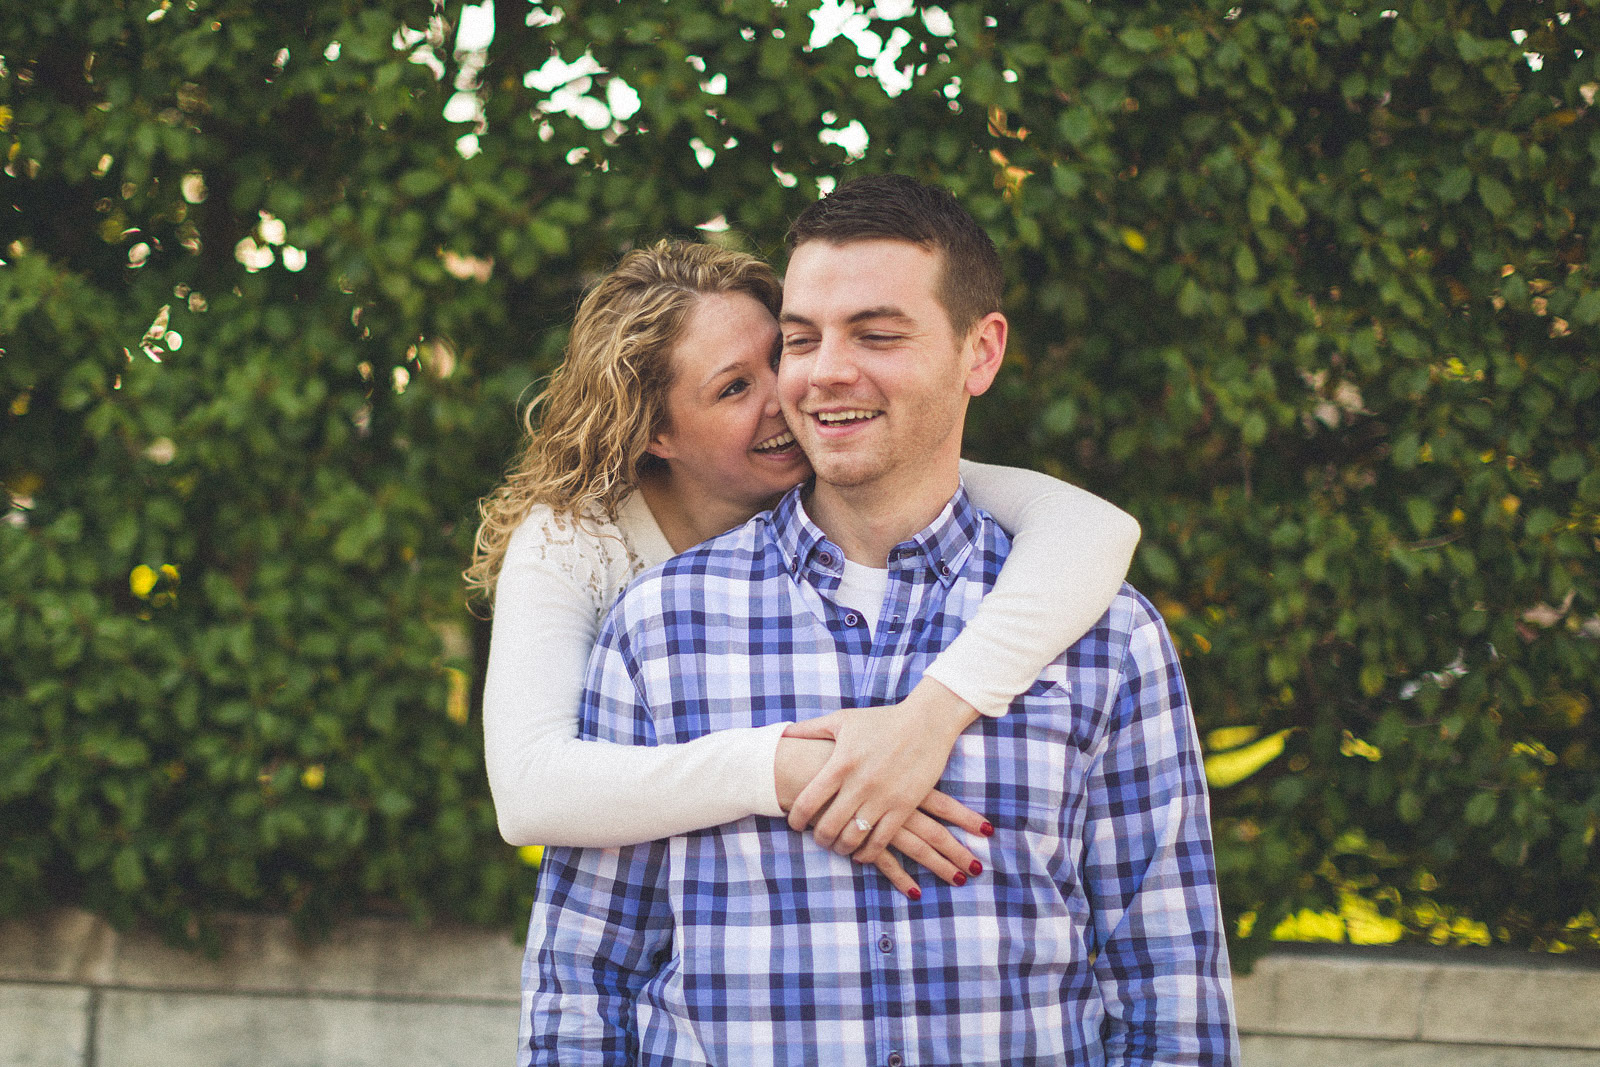 Jockey Hollow Engagement Photos